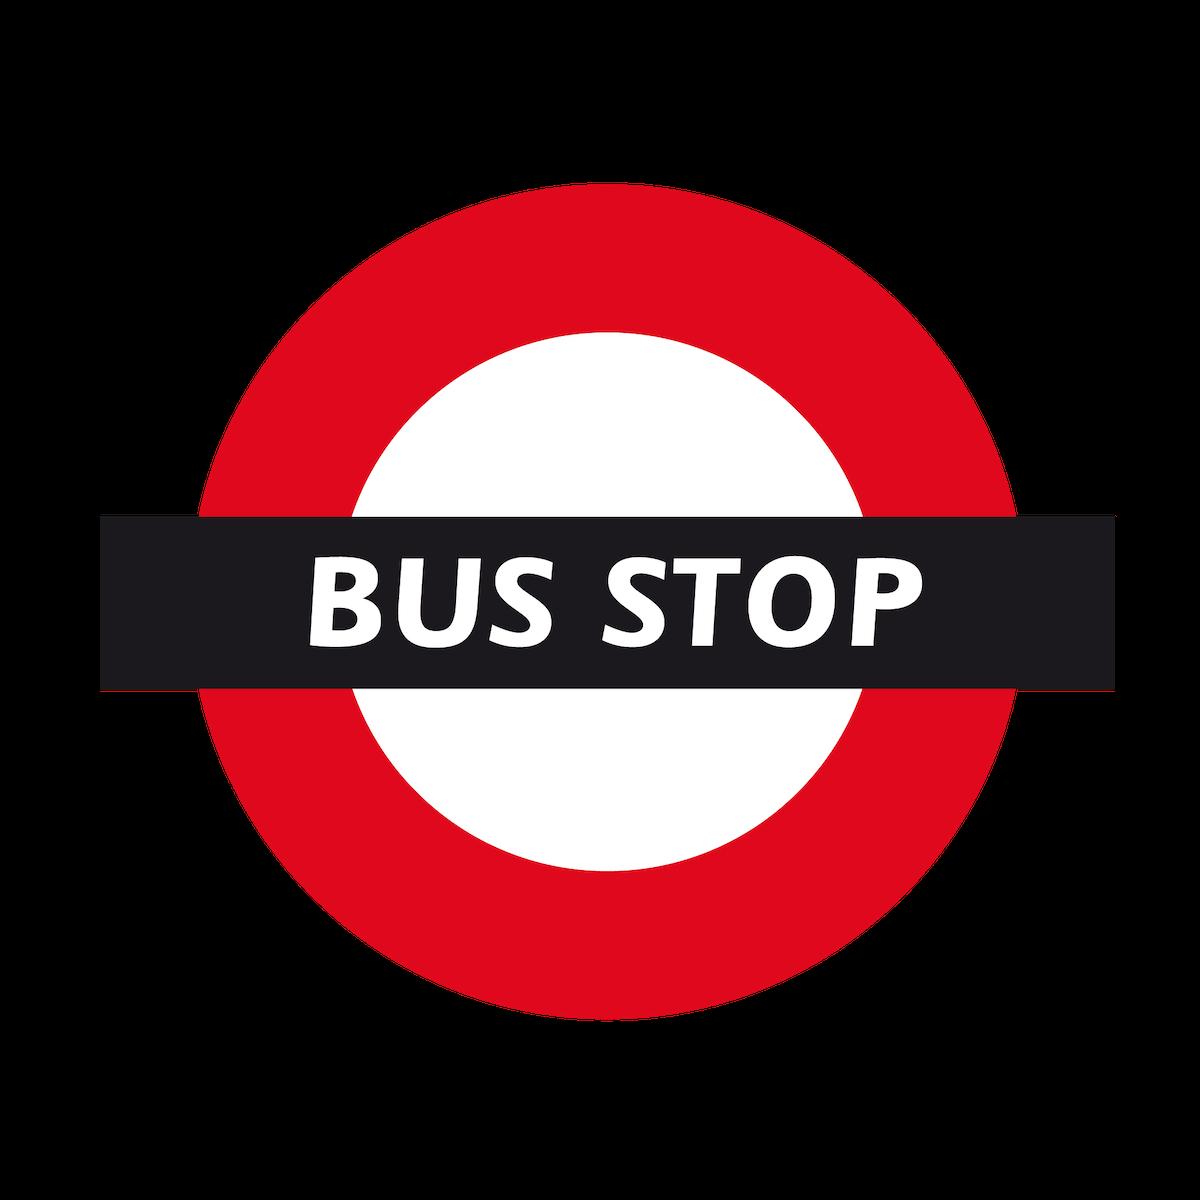 Playground Marking Bus Stop